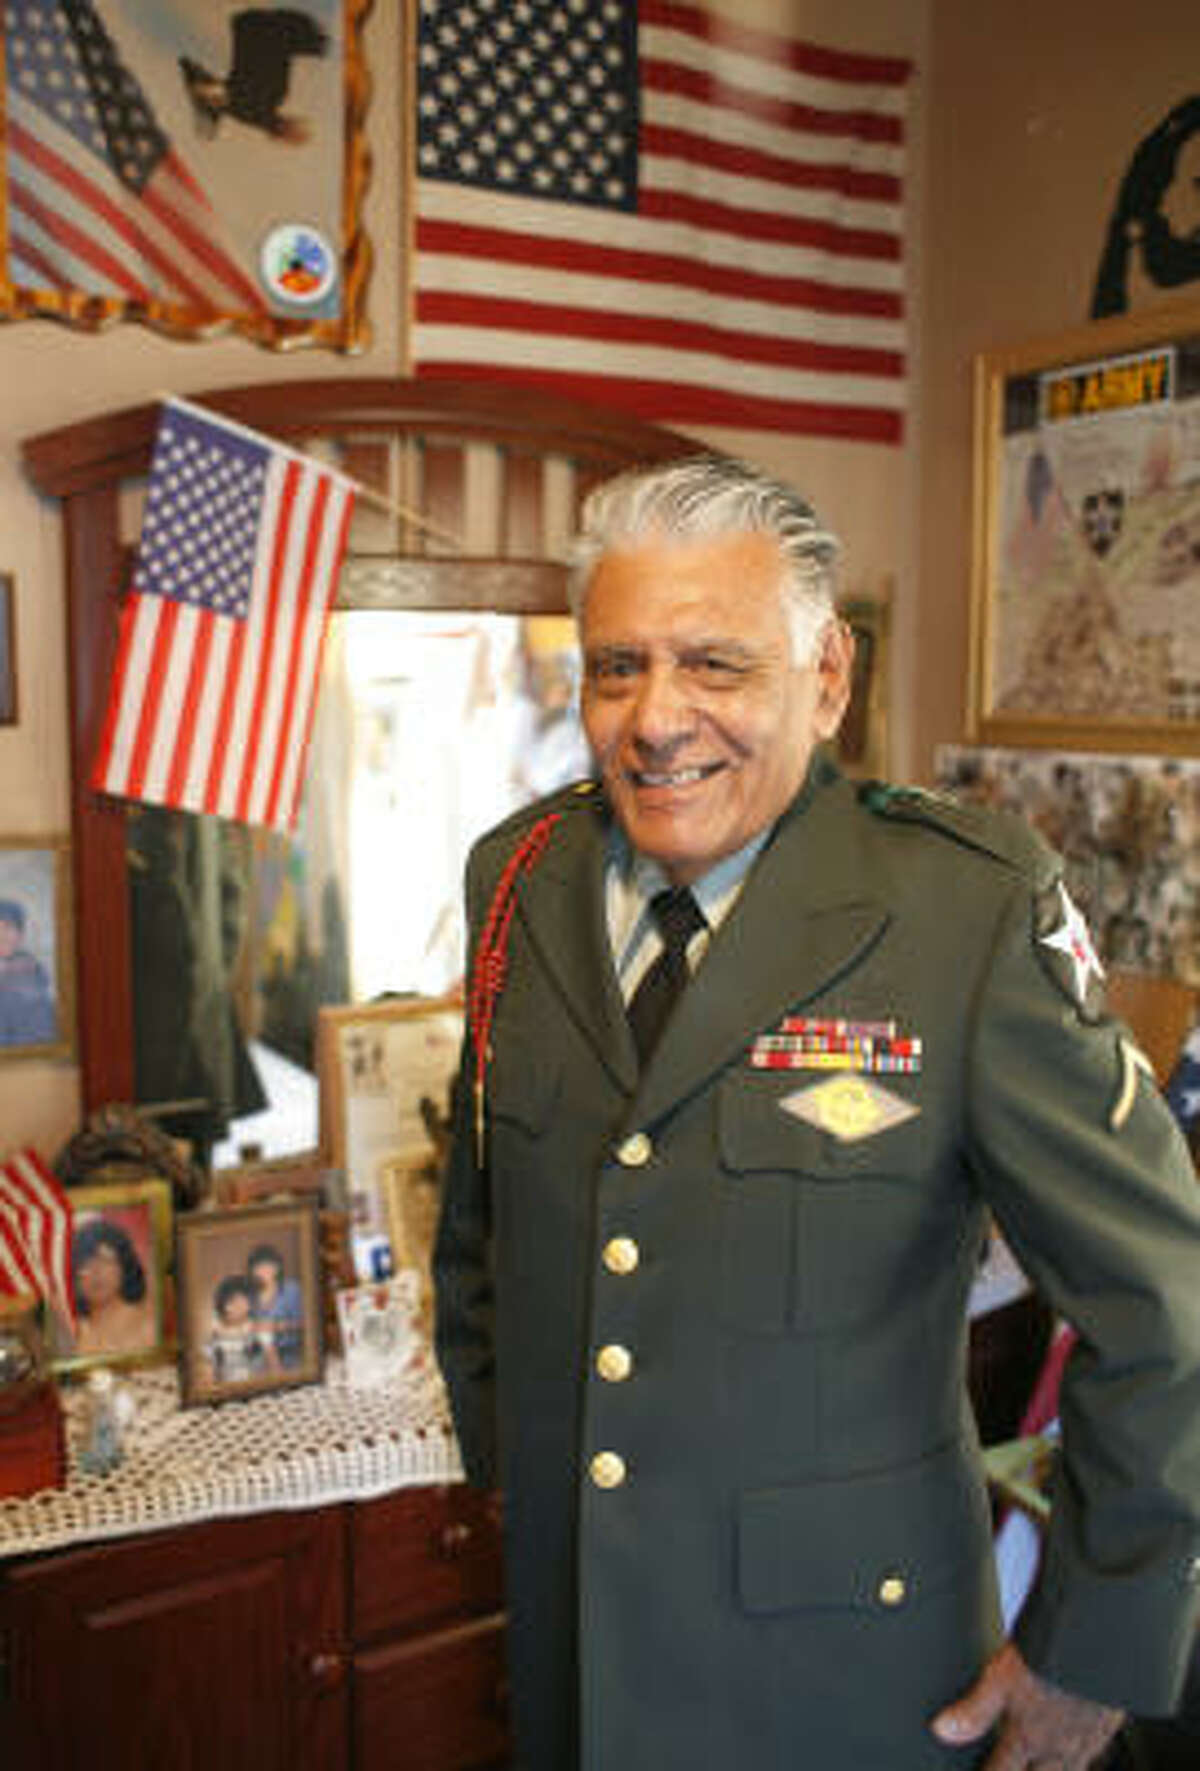 Marino still maintains his uniform and displays his war memorabilia in his home.